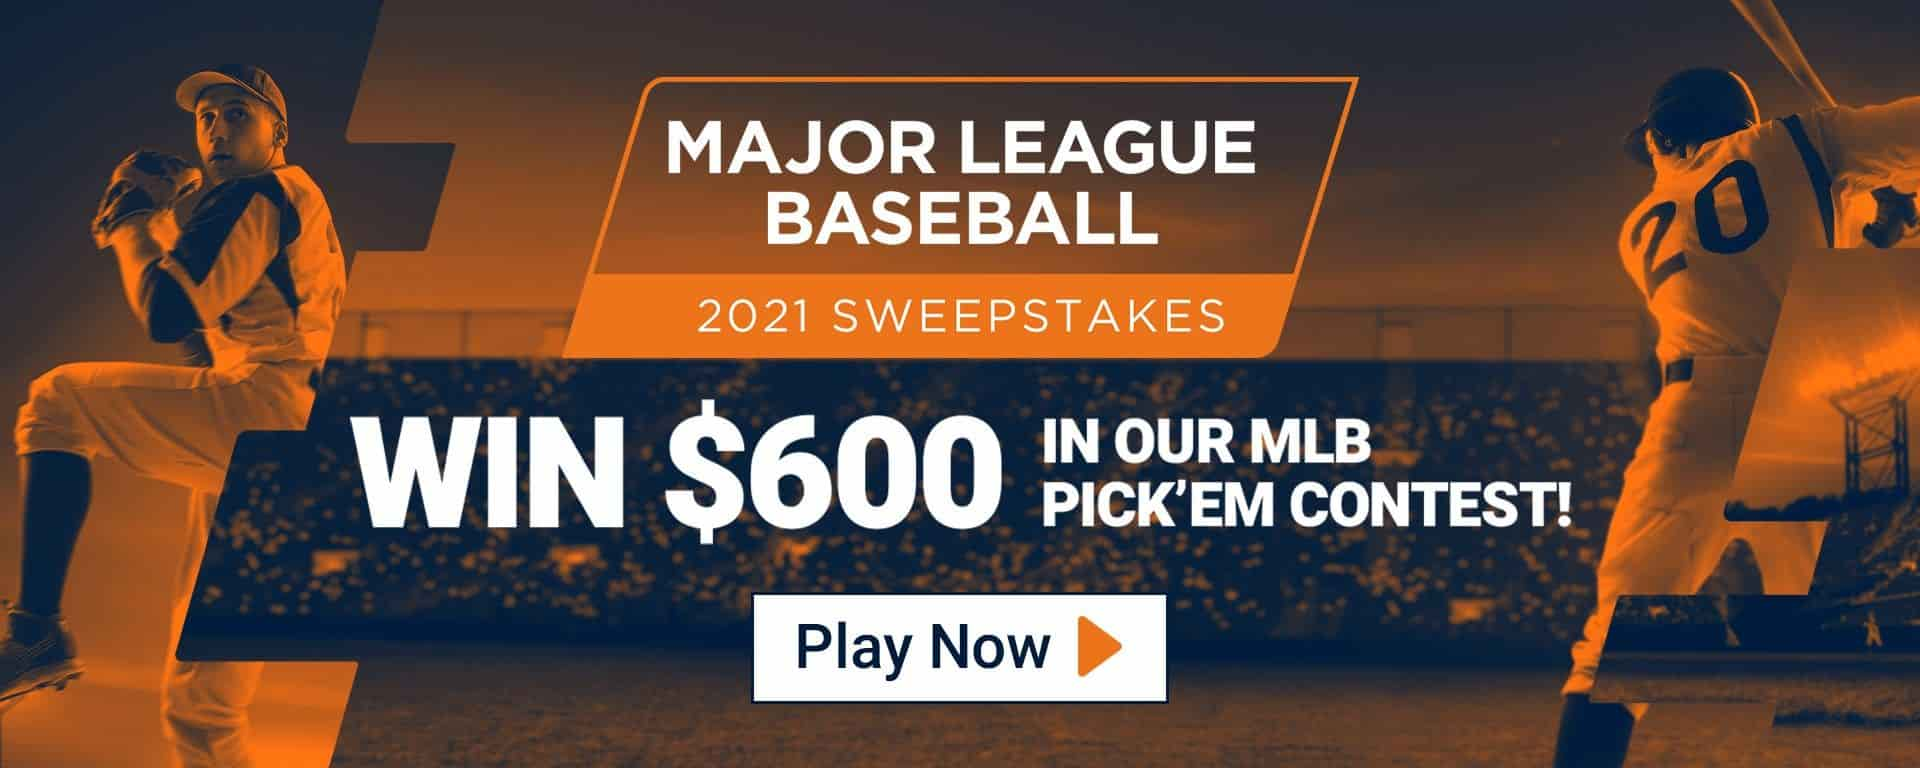 MLB Pick' em Contest $600